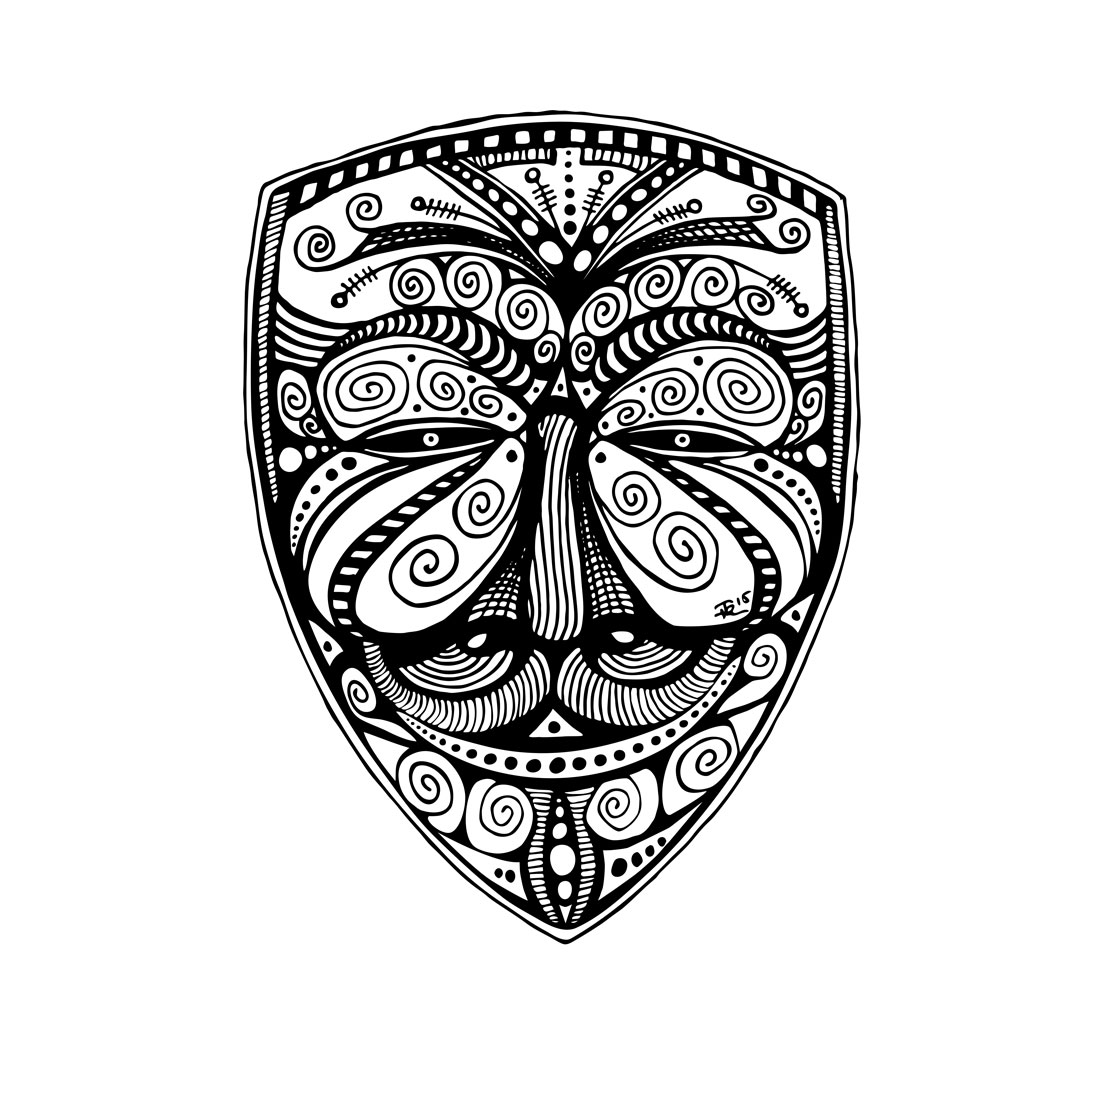 1100x1100 Jmervz Inkworks Pen Amp Ink Ornate Anonymous Mask